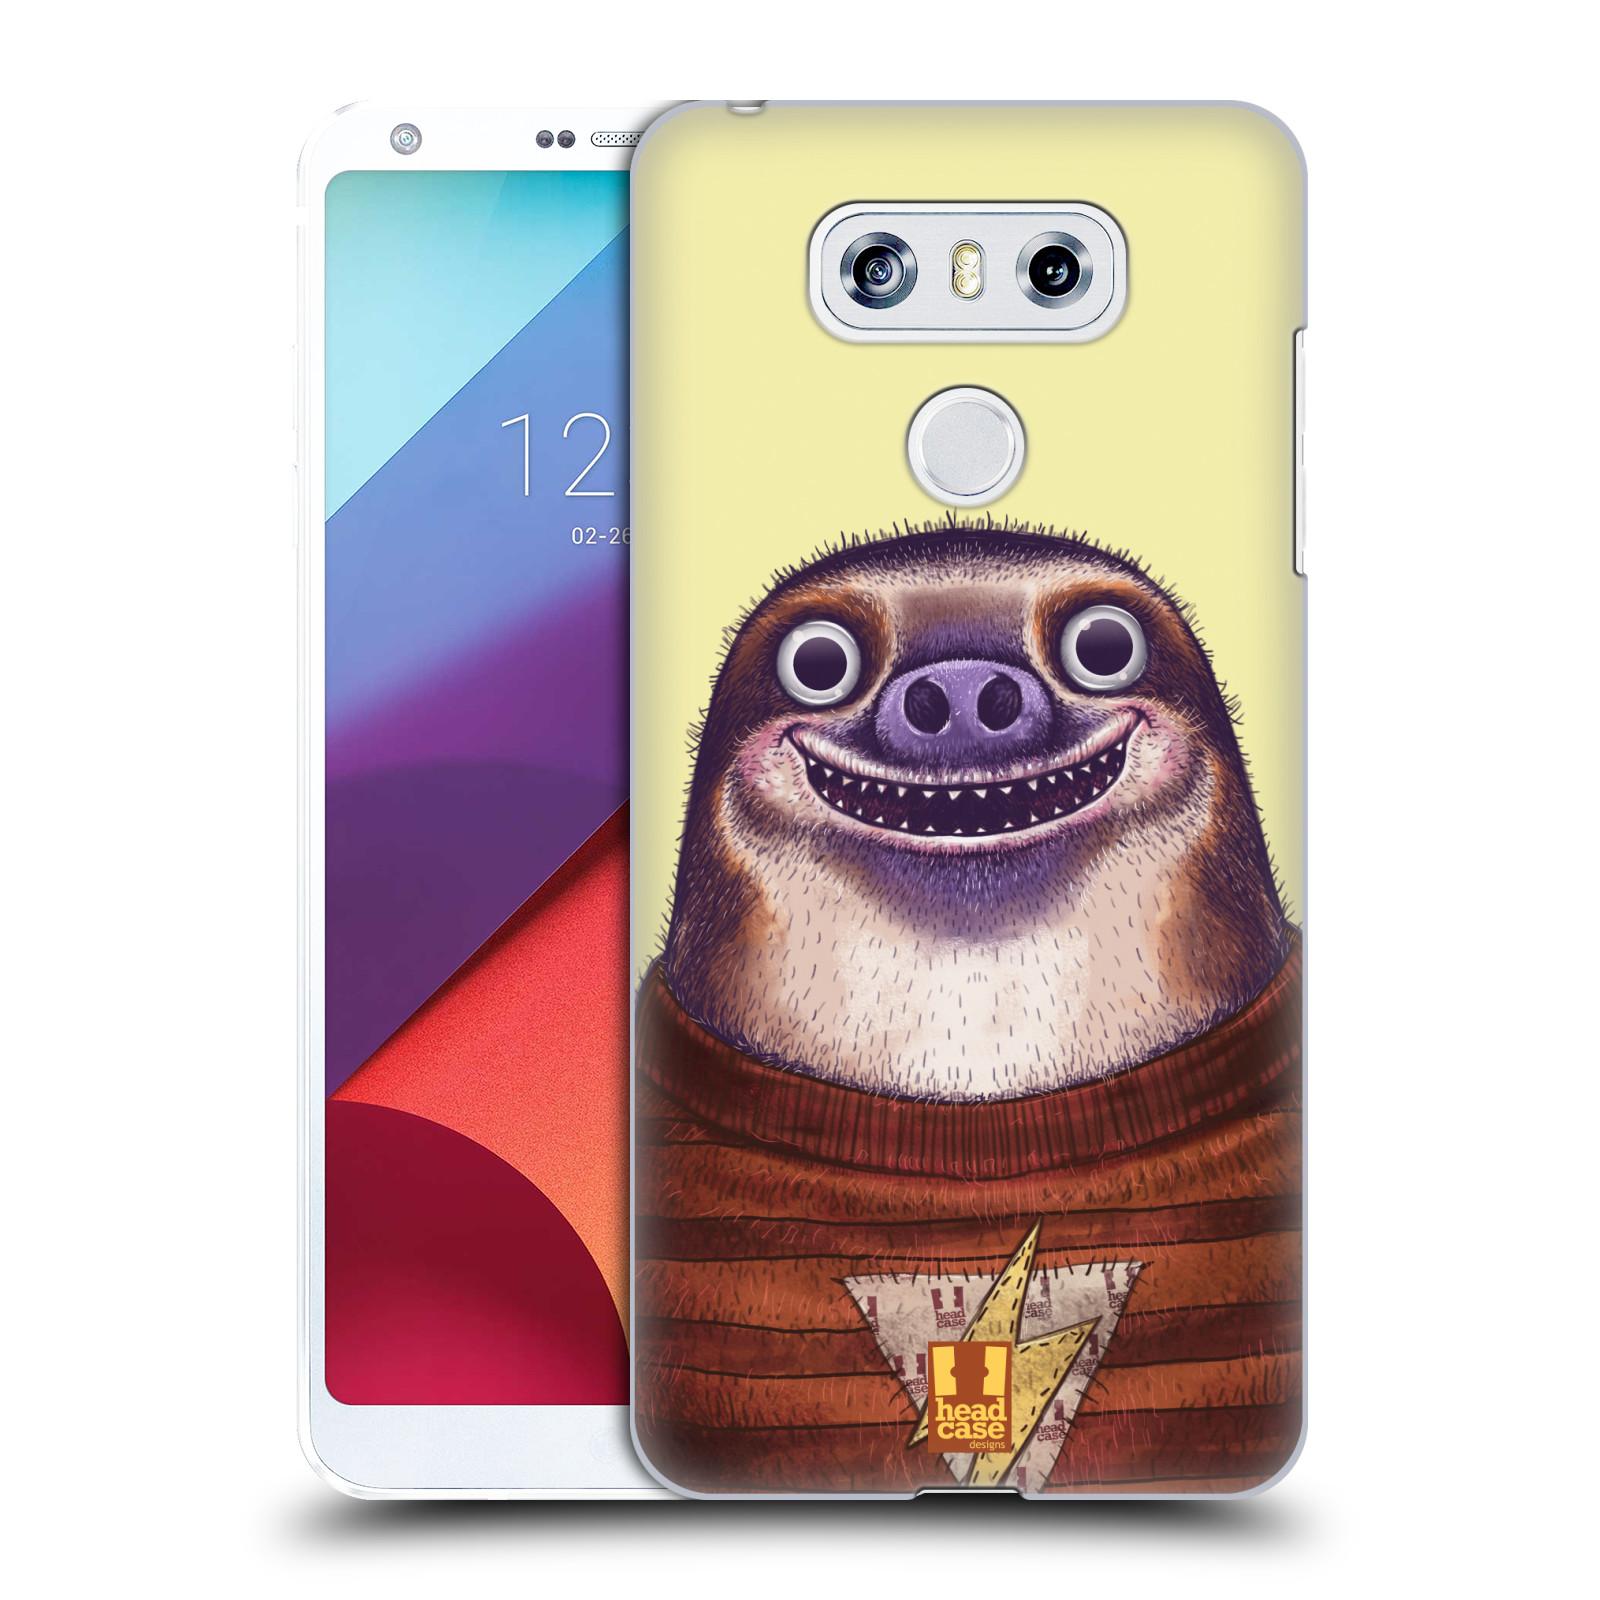 Plastové pouzdro na mobil LG G6 - Head Case ANIMPLA LENOCHOD